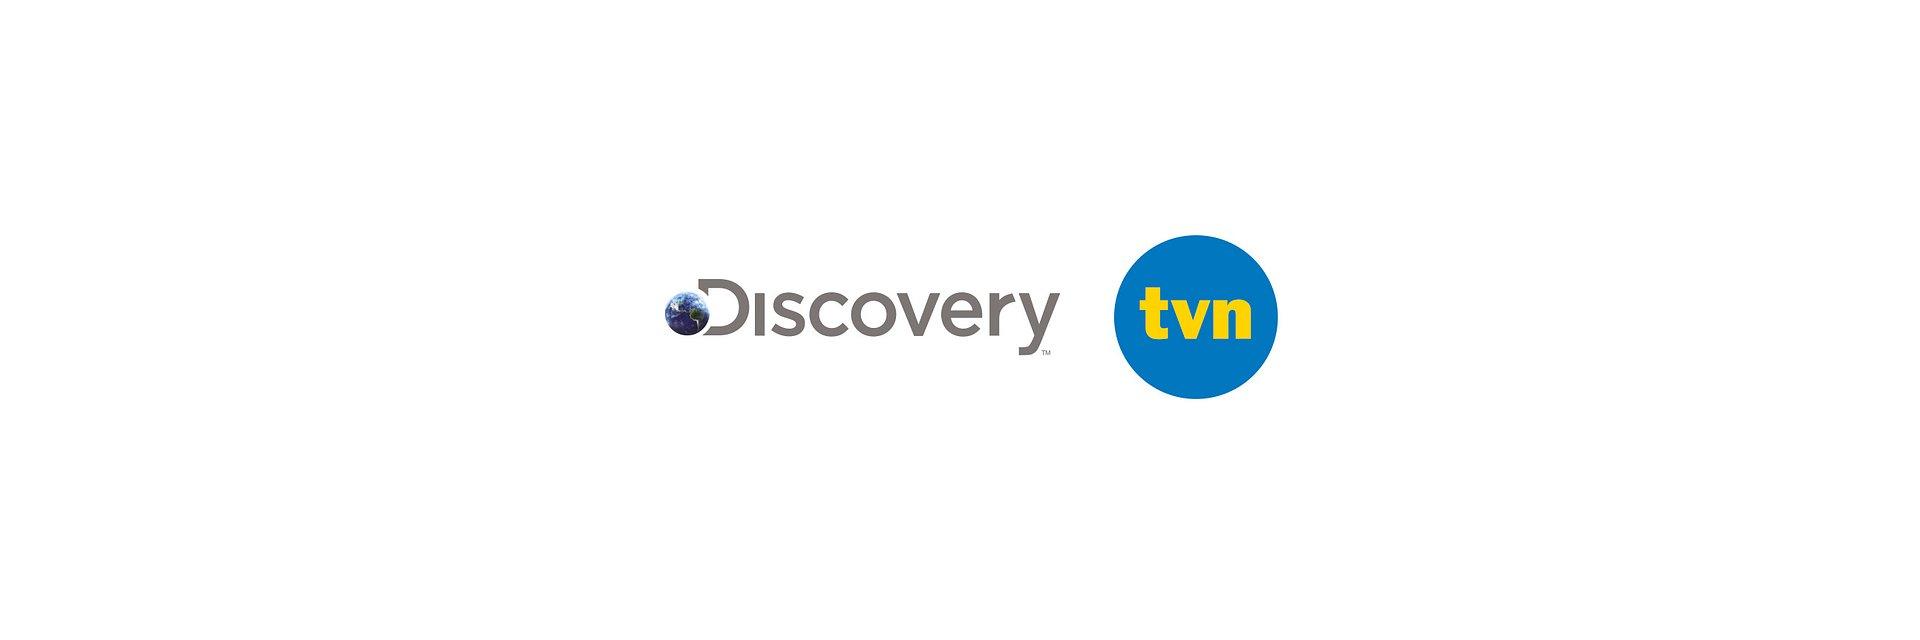 Kanał Red Carpet TV w ofercie TVN Media od lutego 2019